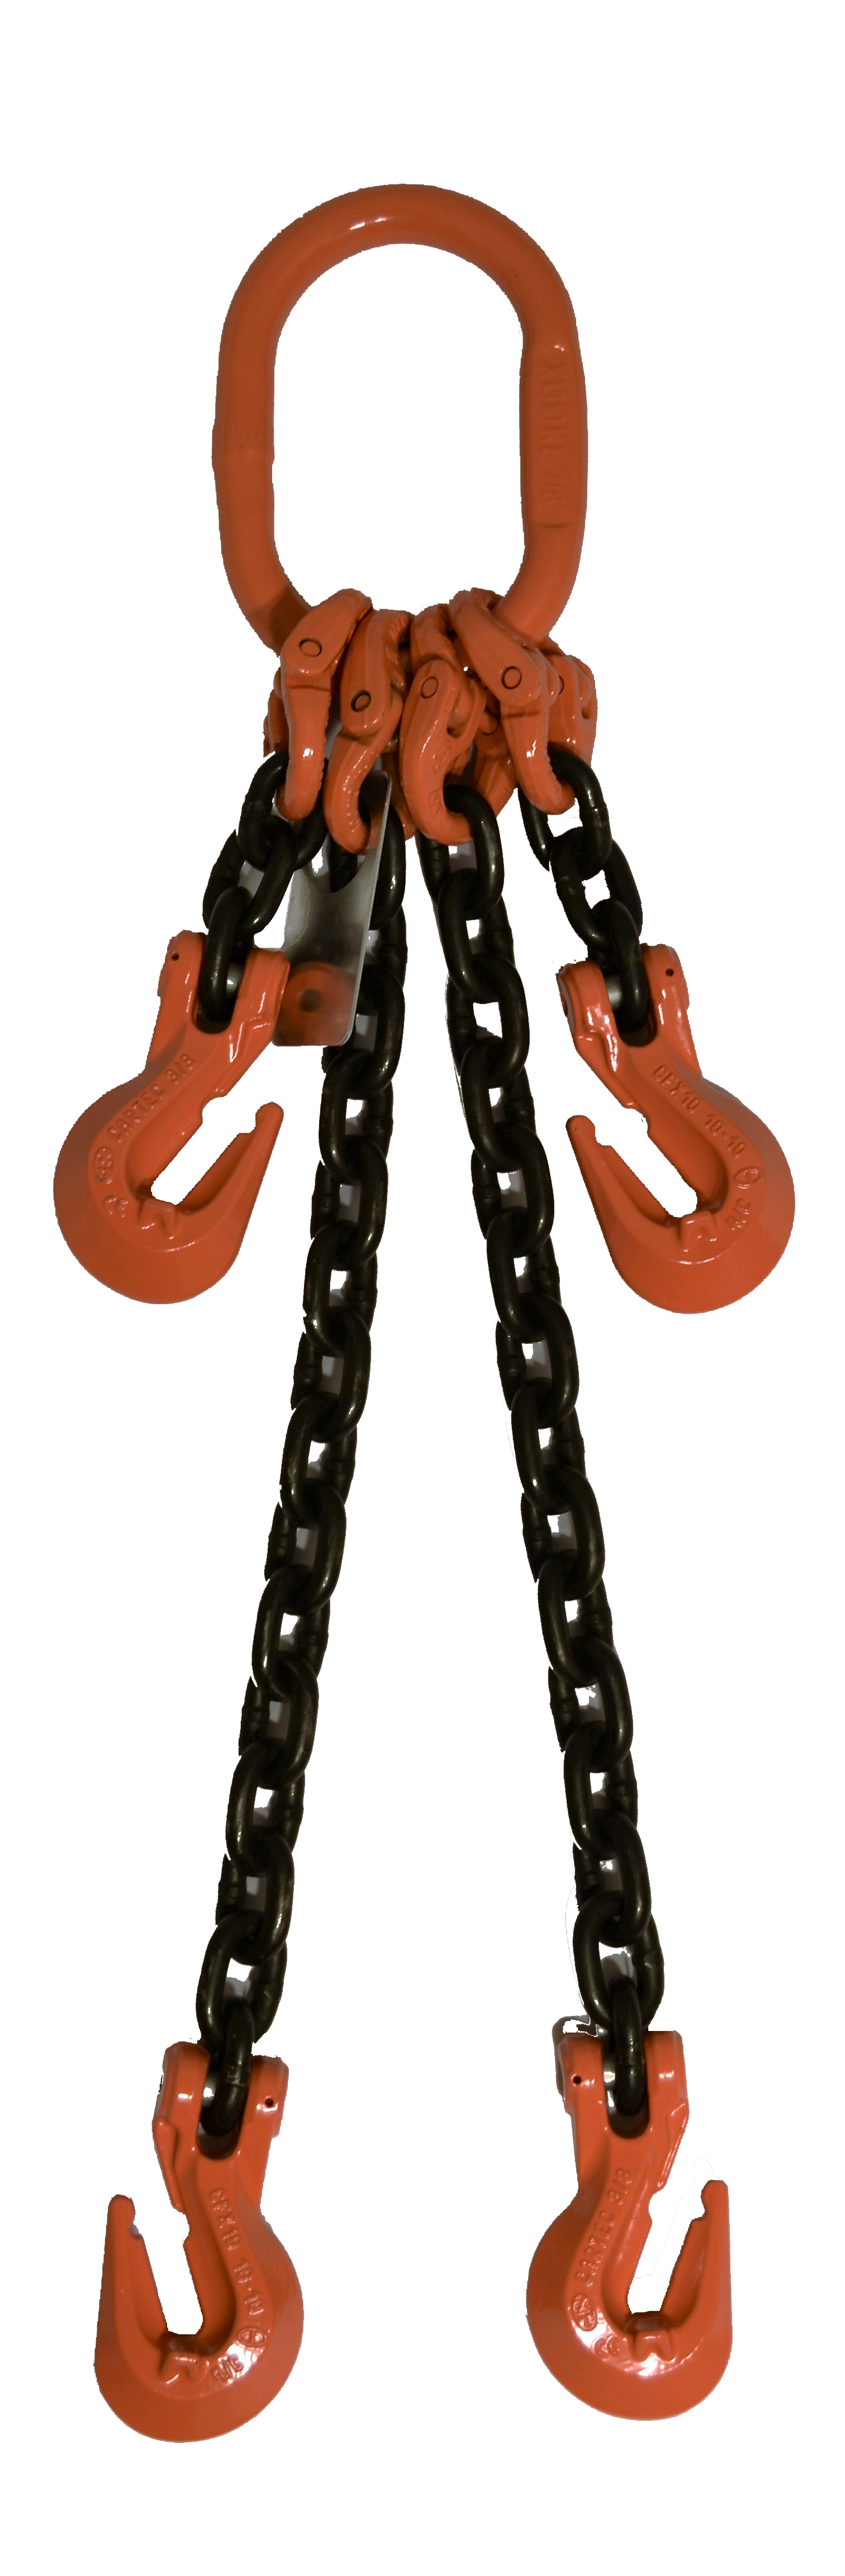 ADOG GR-100 Chain Sling